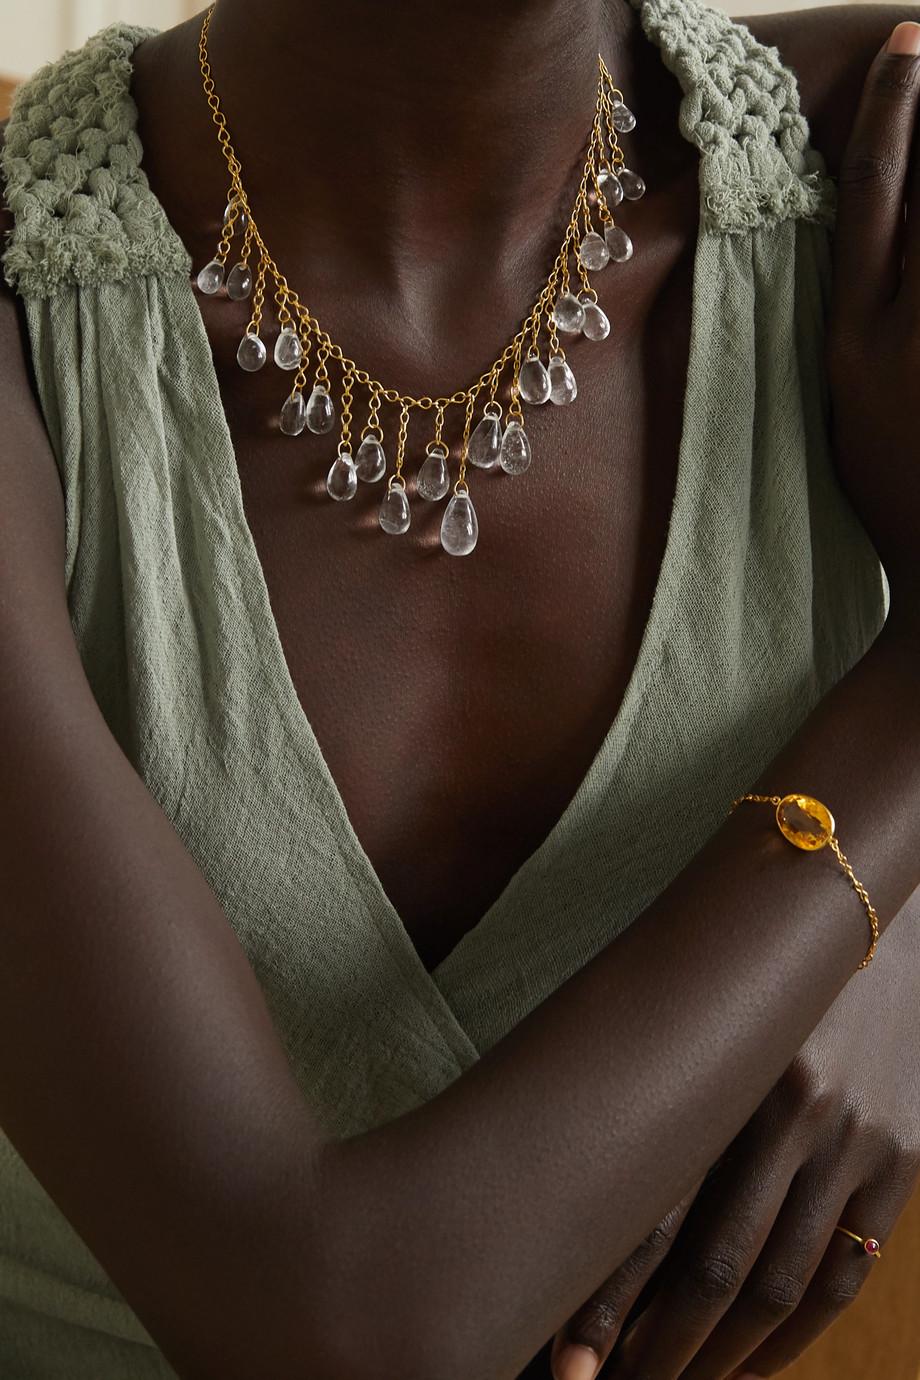 Pippa Small 18-karat gold quartz necklace